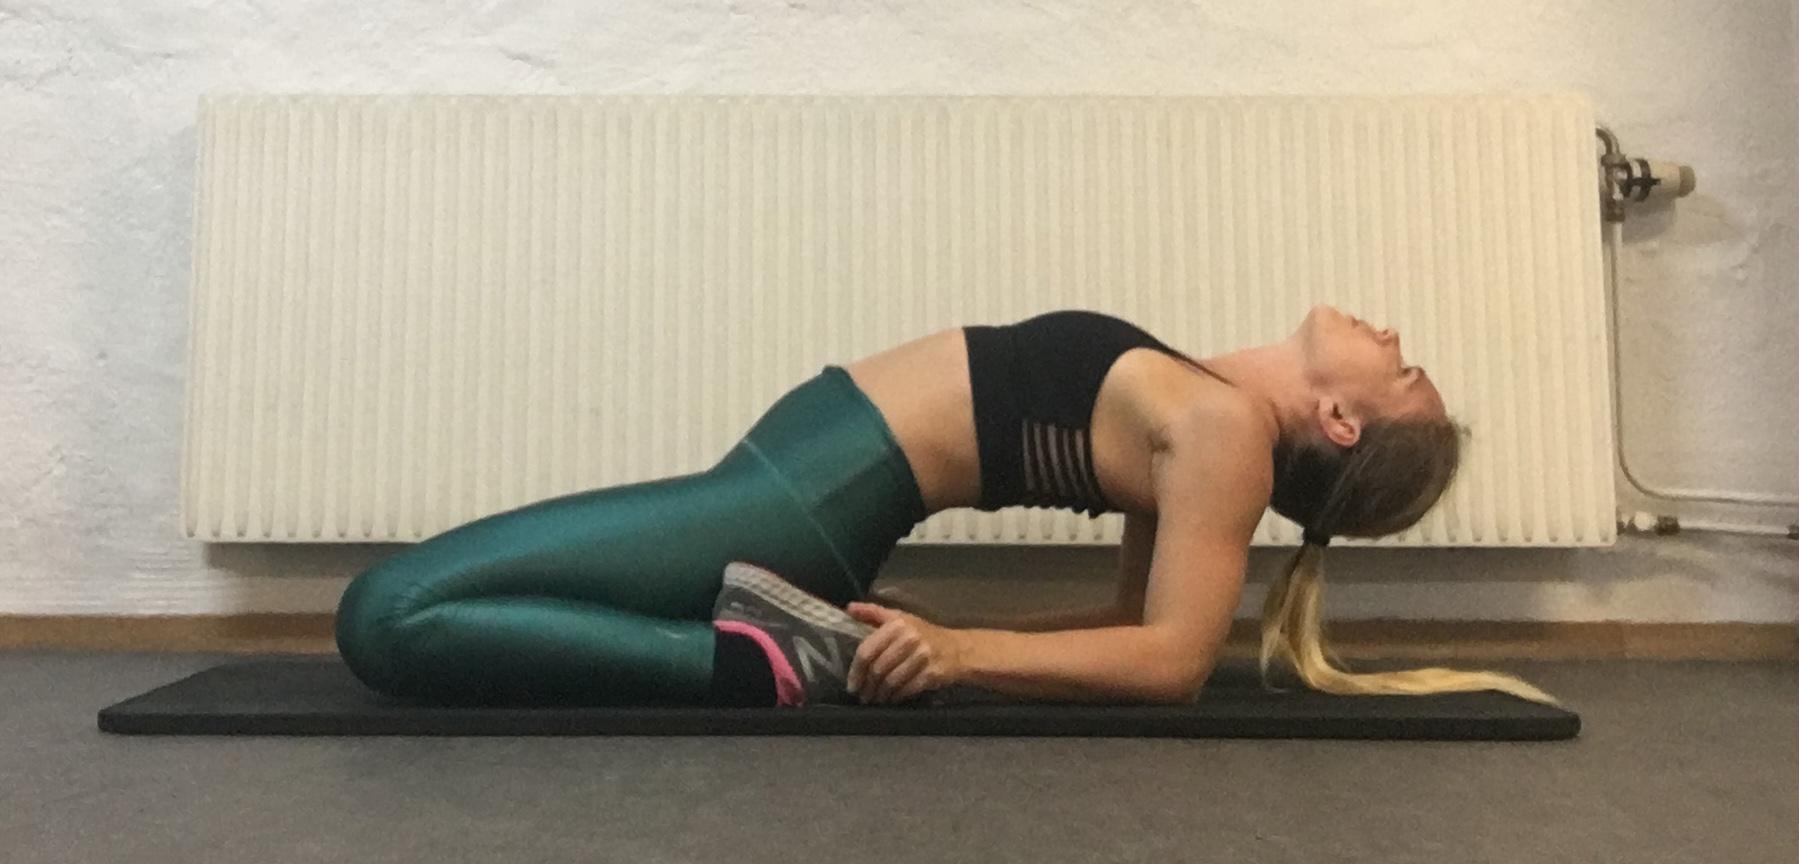 Sadeln yogaövning, yogaposition sadle